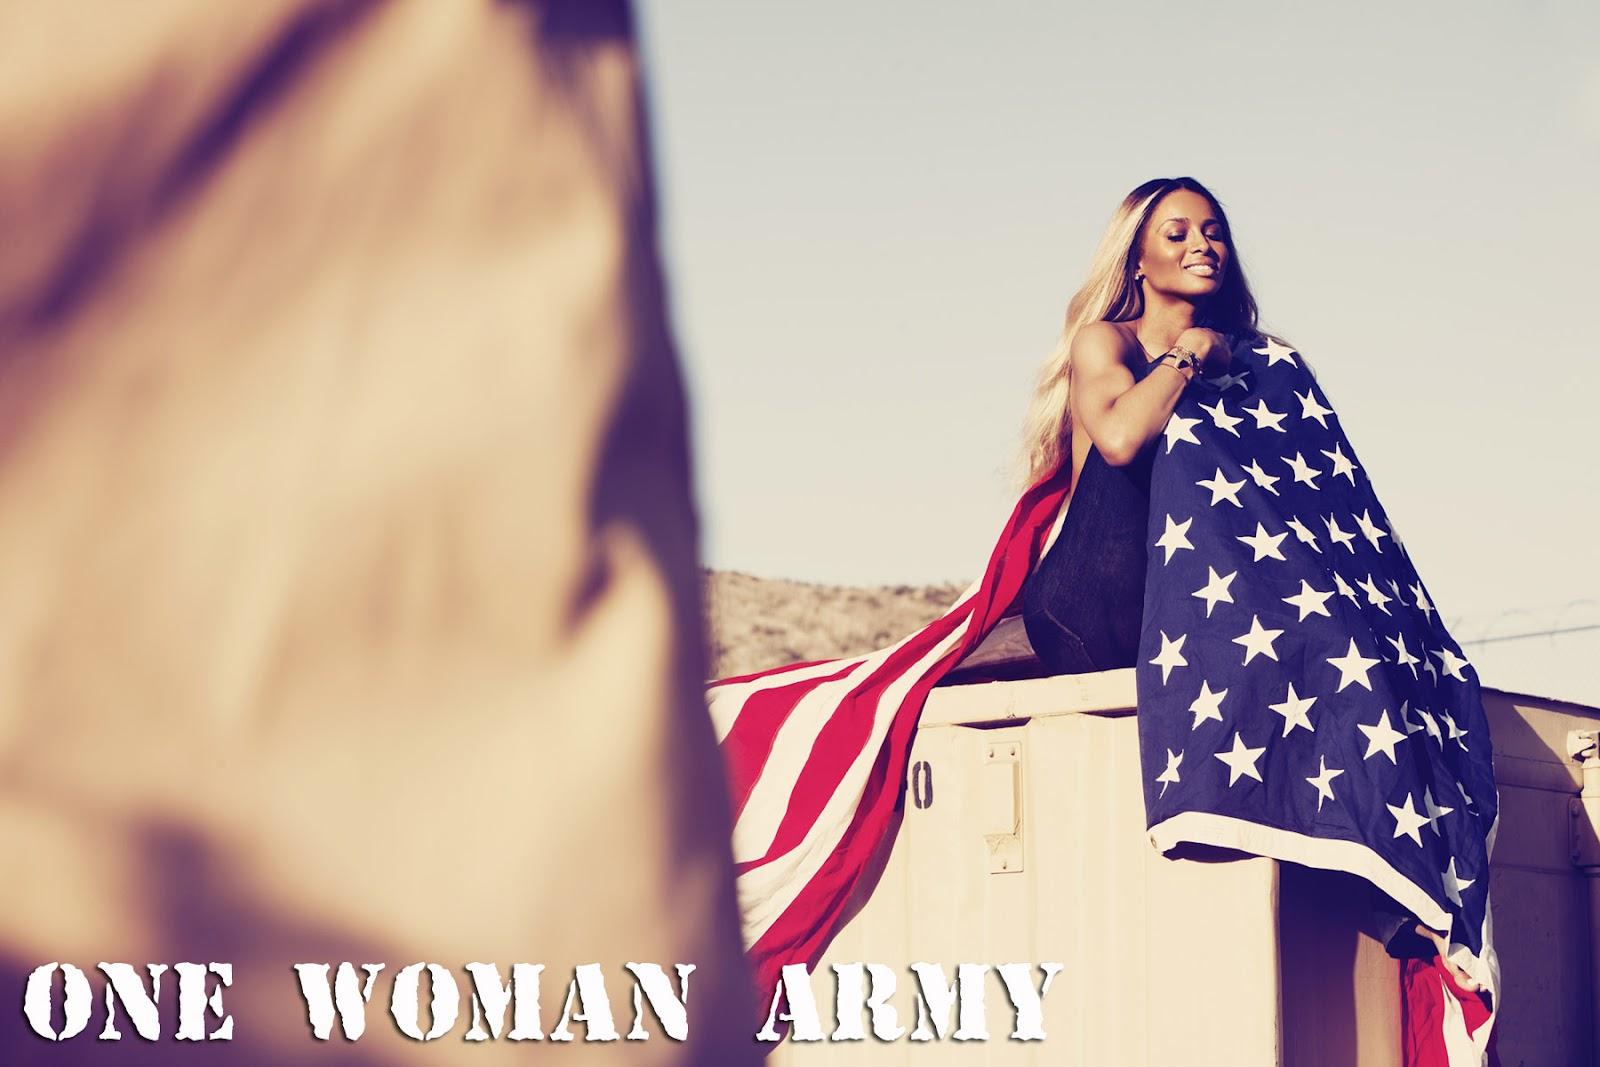 http://2.bp.blogspot.com/-lIbIoxKuoX8/T8raBAIK5gI/AAAAAAAAKsc/rNG94ZjwGoQ/s1600/army2.jpg